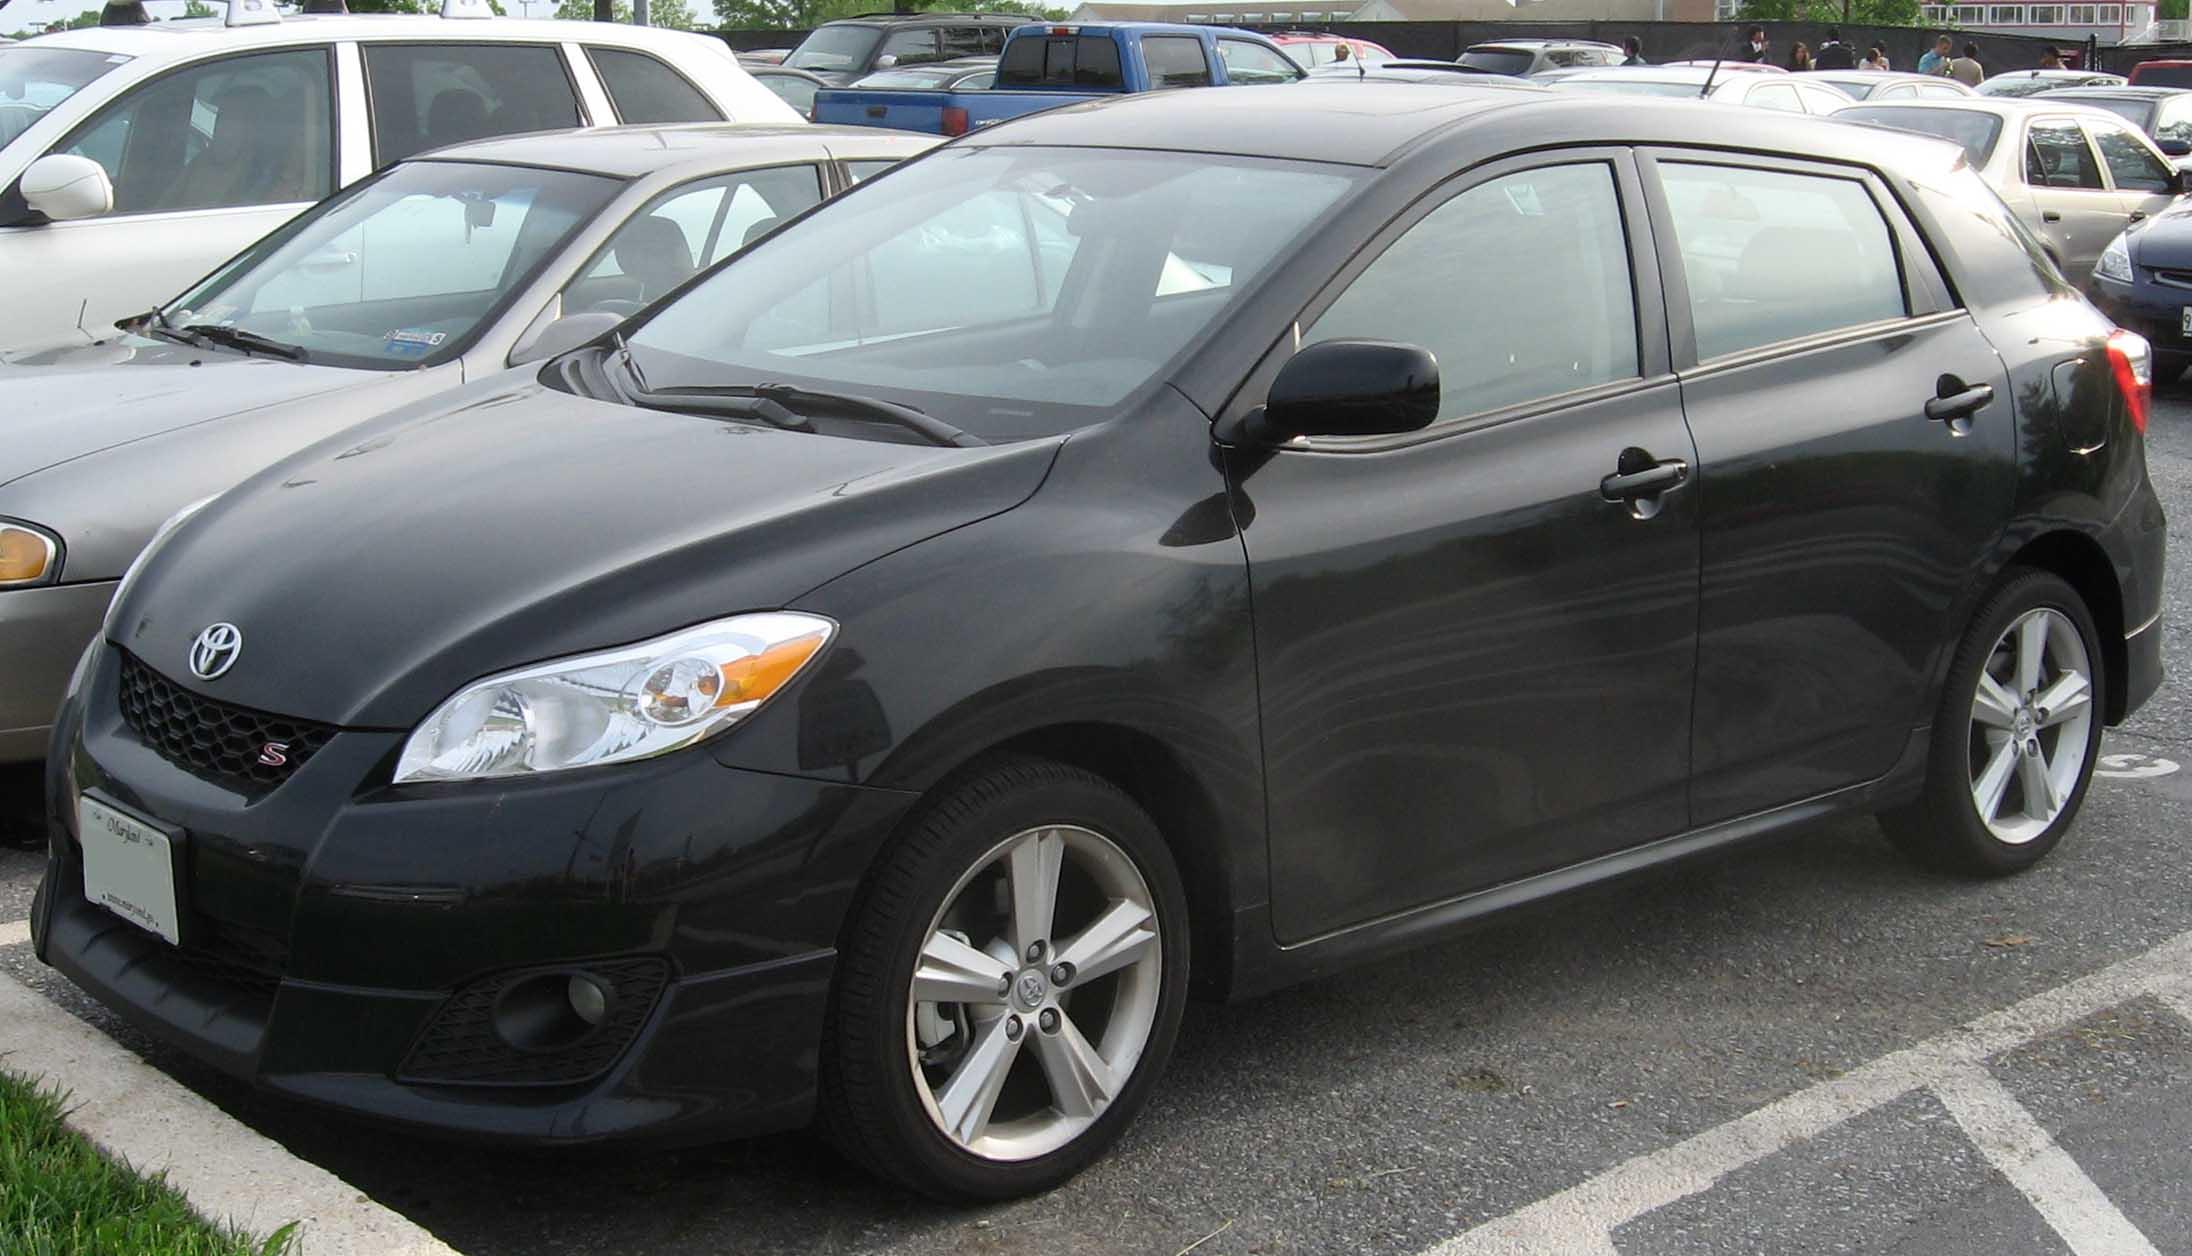 File:2009 Toyota Matrix S.jpg - Wikimedia Commons